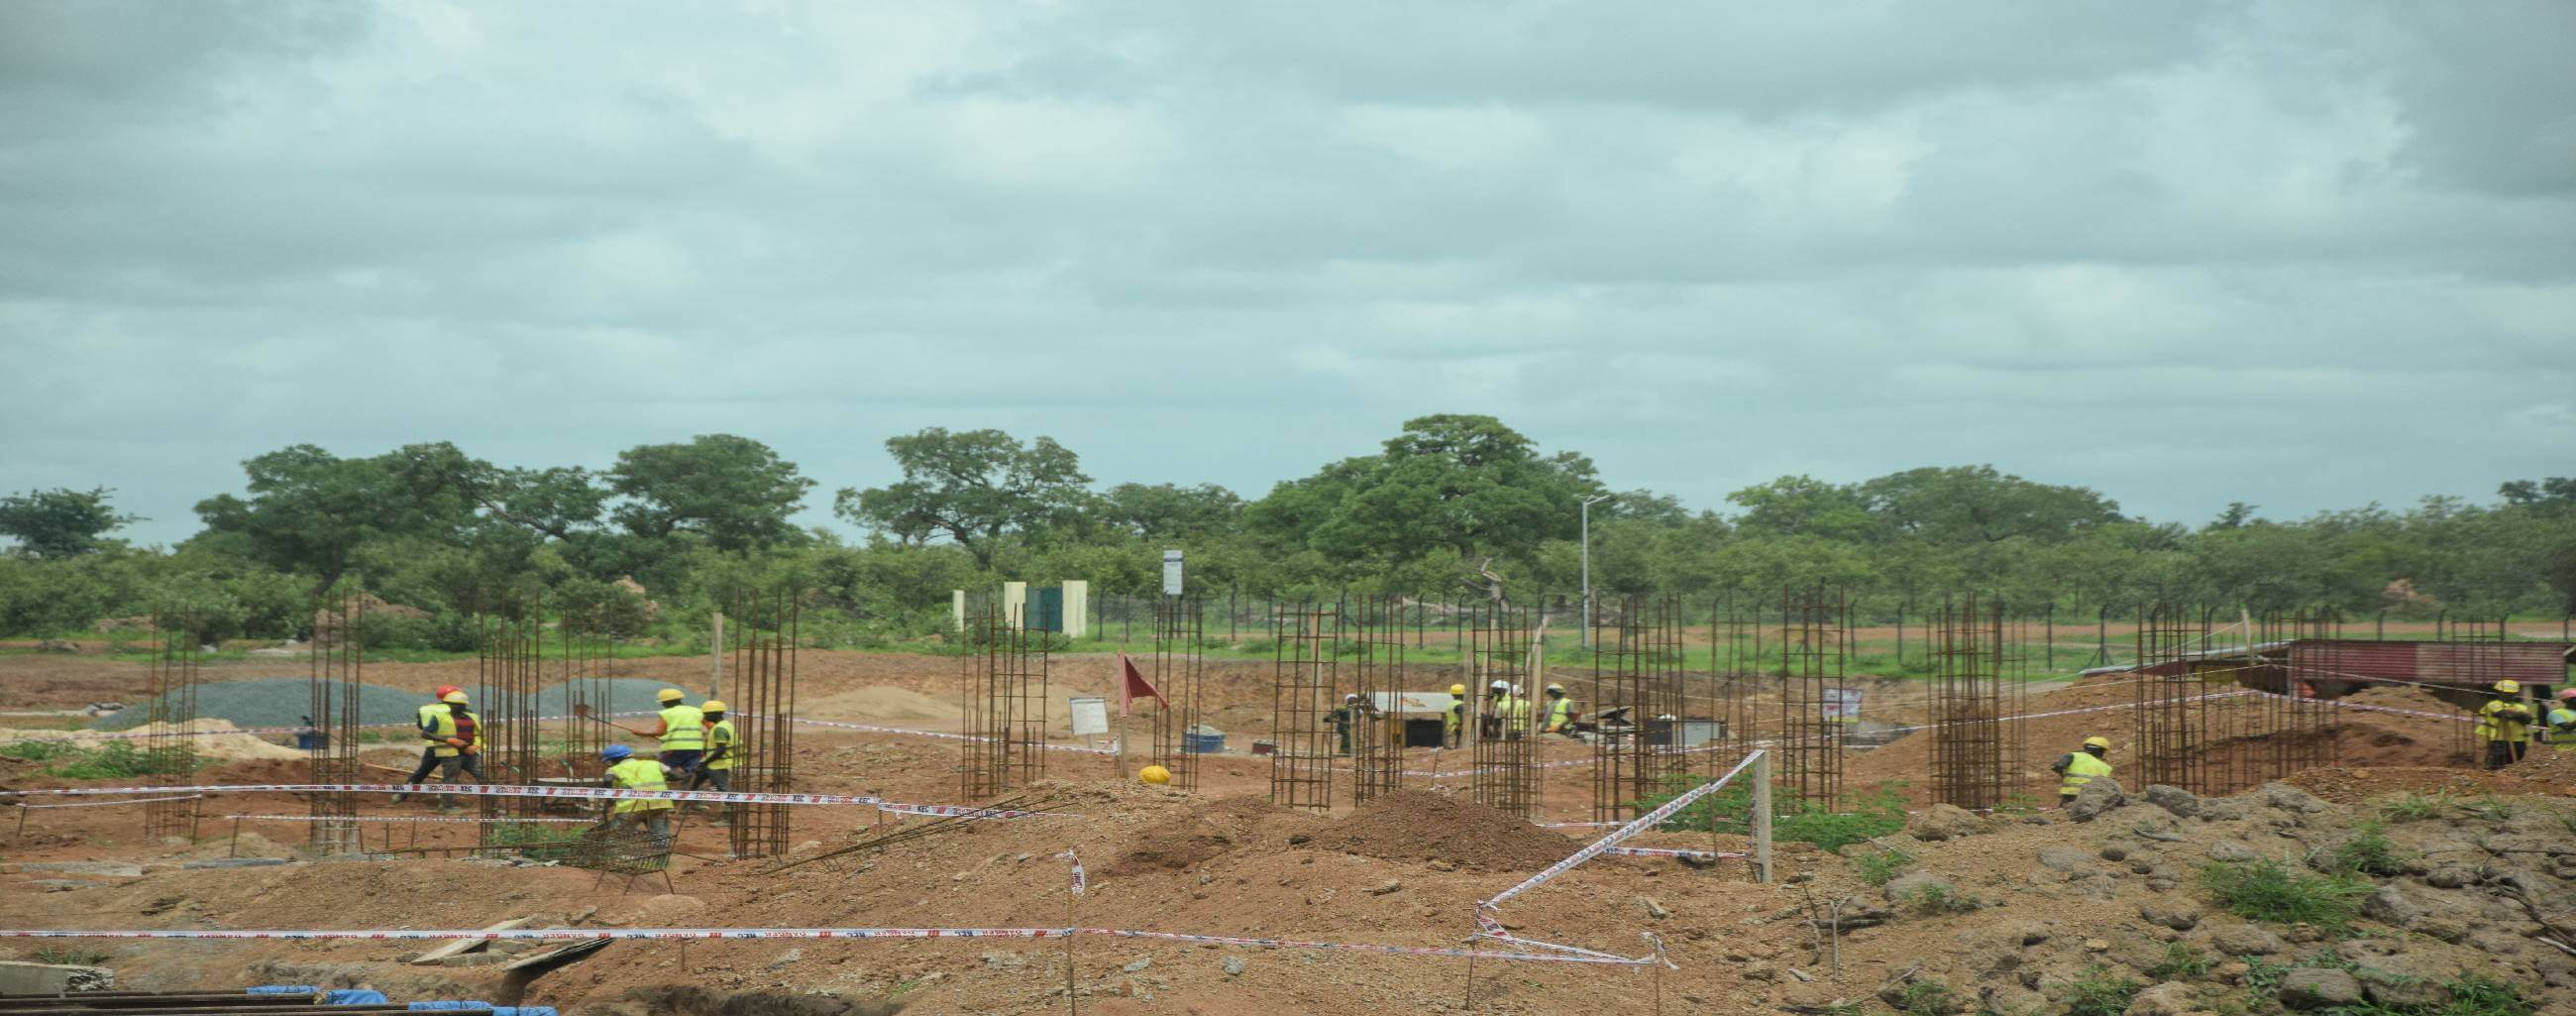 Chantier Projet Energie à Kédougou Projet Energie Tamba